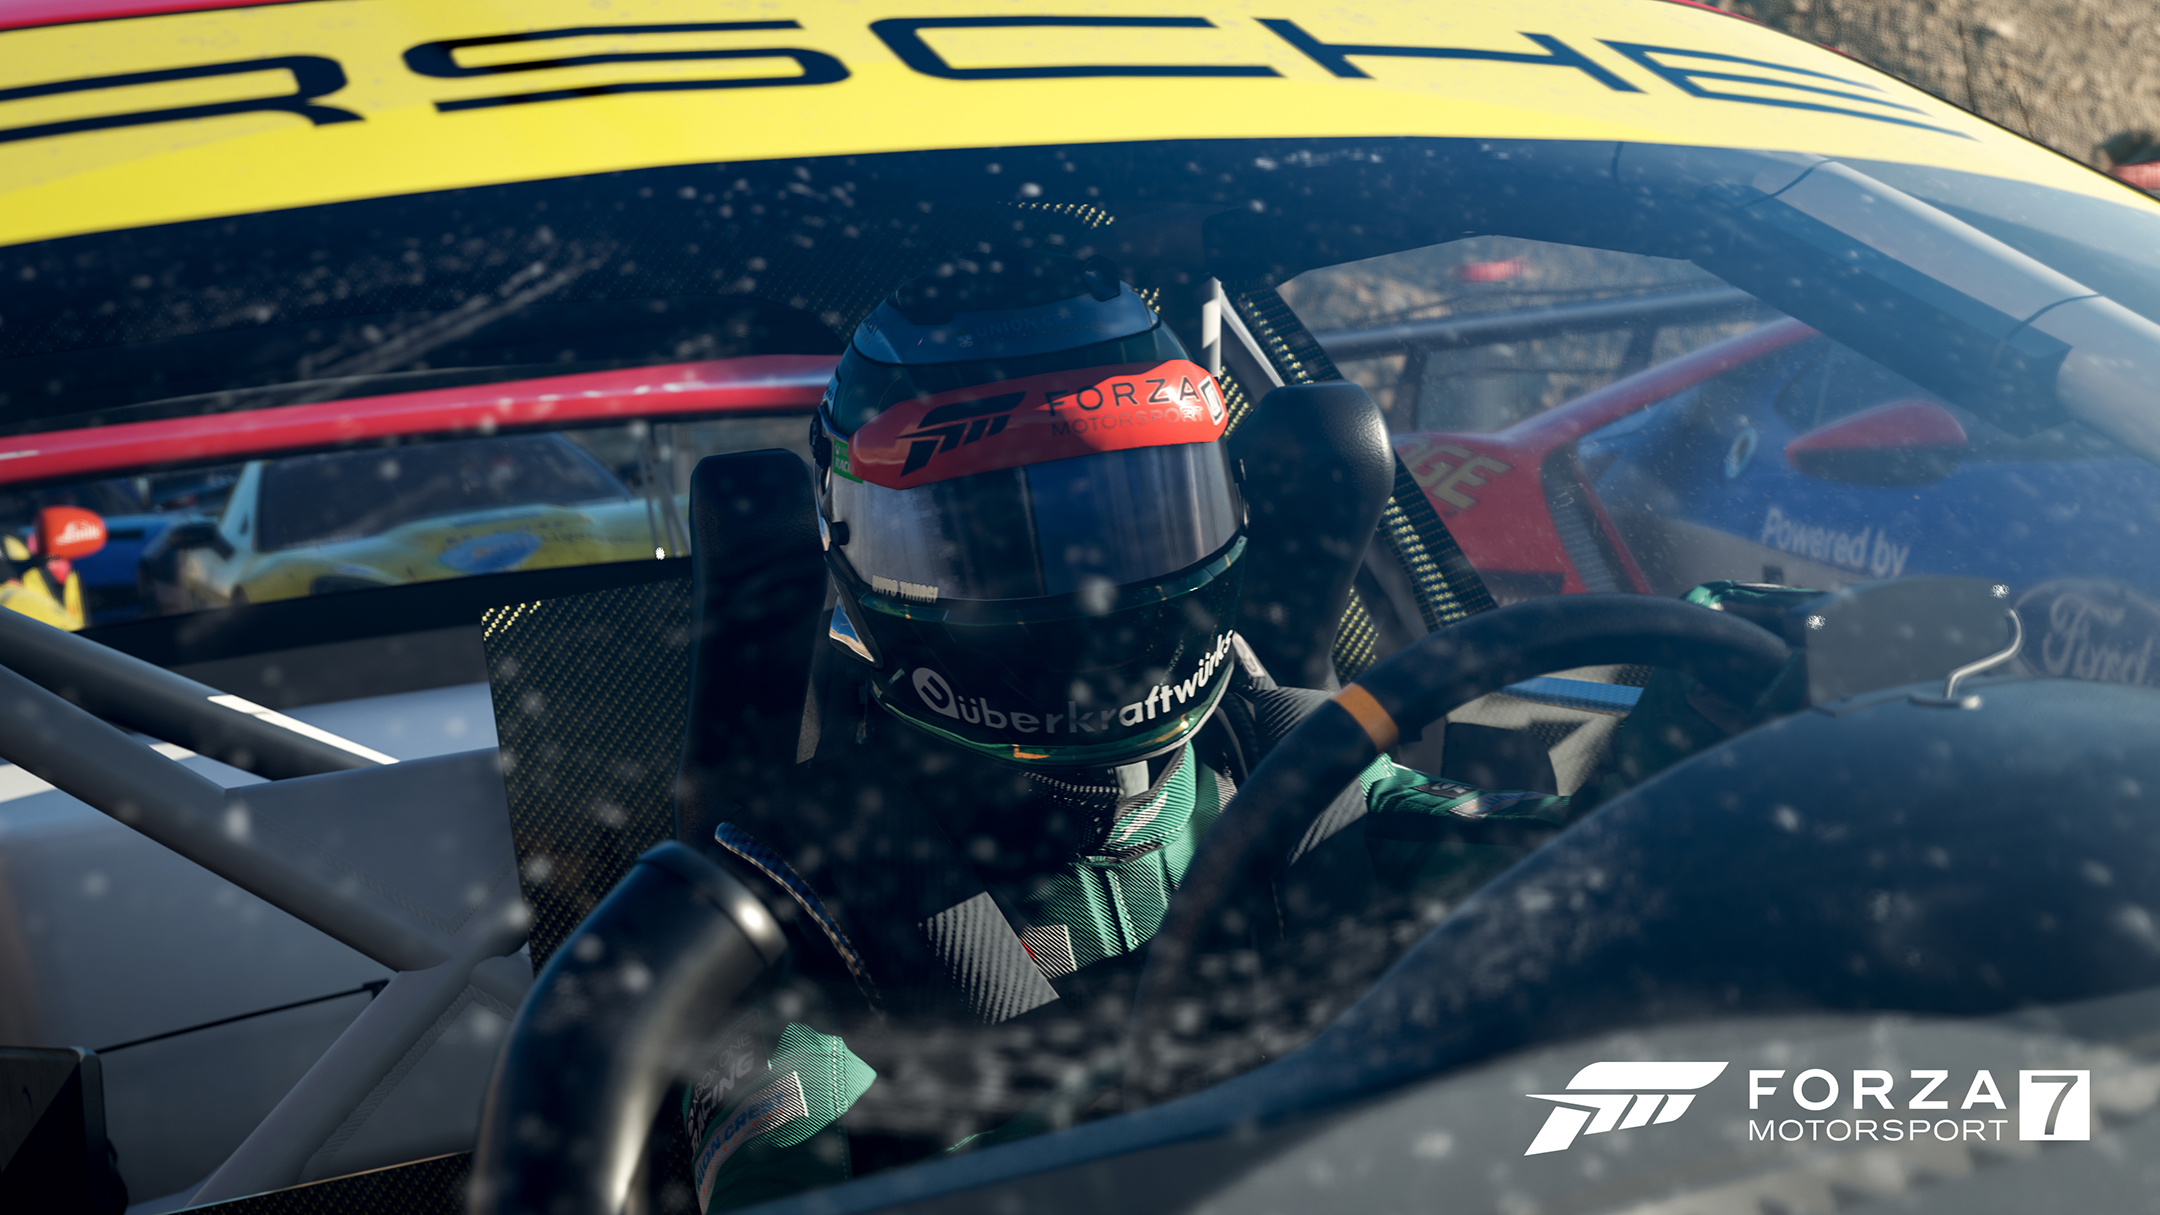 Forza Motorsport 7 - screen - Porsche Driver